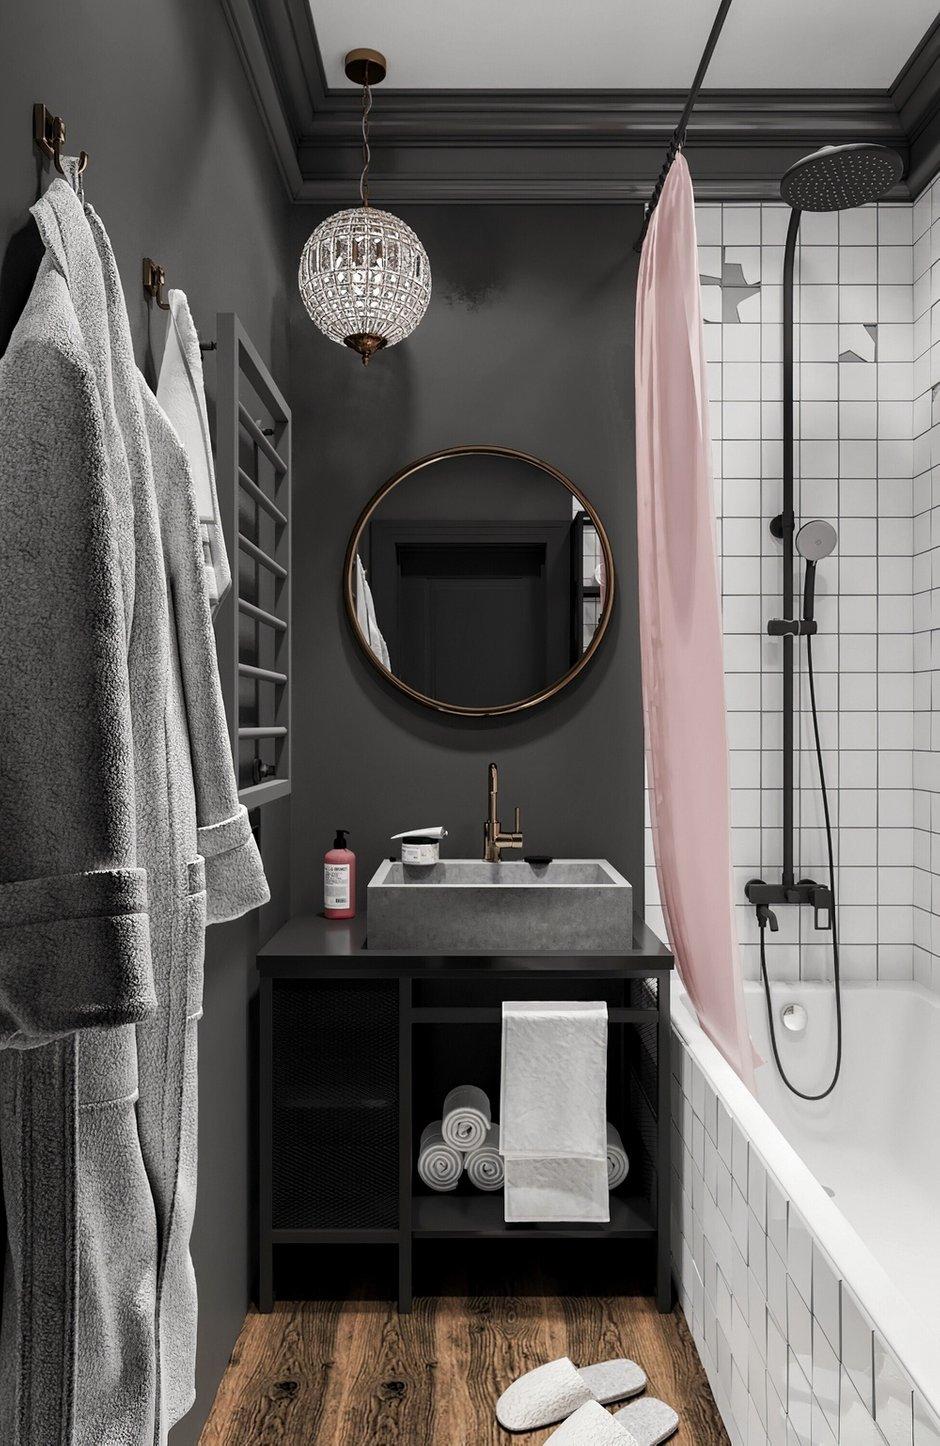 Фотография: Ванная в стиле Лофт, Эклектика, Квартира, Проект недели, Москва, 3 комнаты, 60-90 метров, Анна Показаньева – фото на INMYROOM